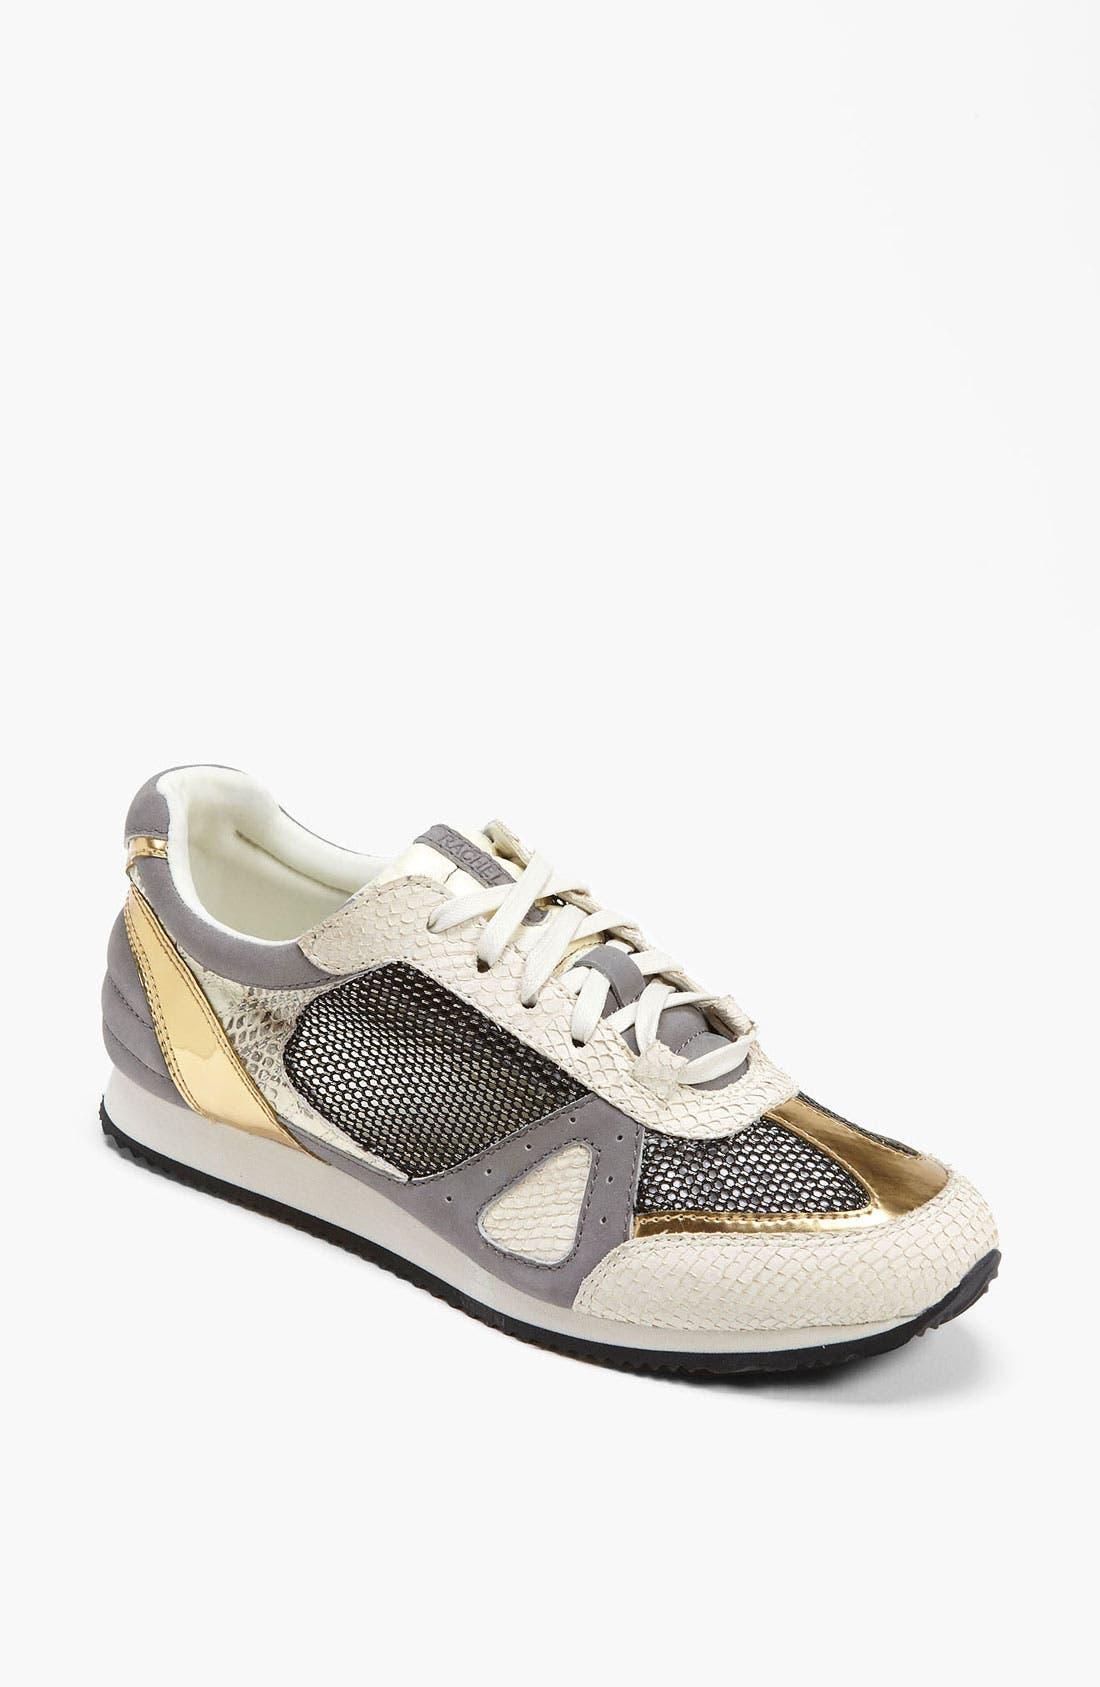 Alternate Image 1 Selected - Rachel Zoe 'Jeni' Sneaker